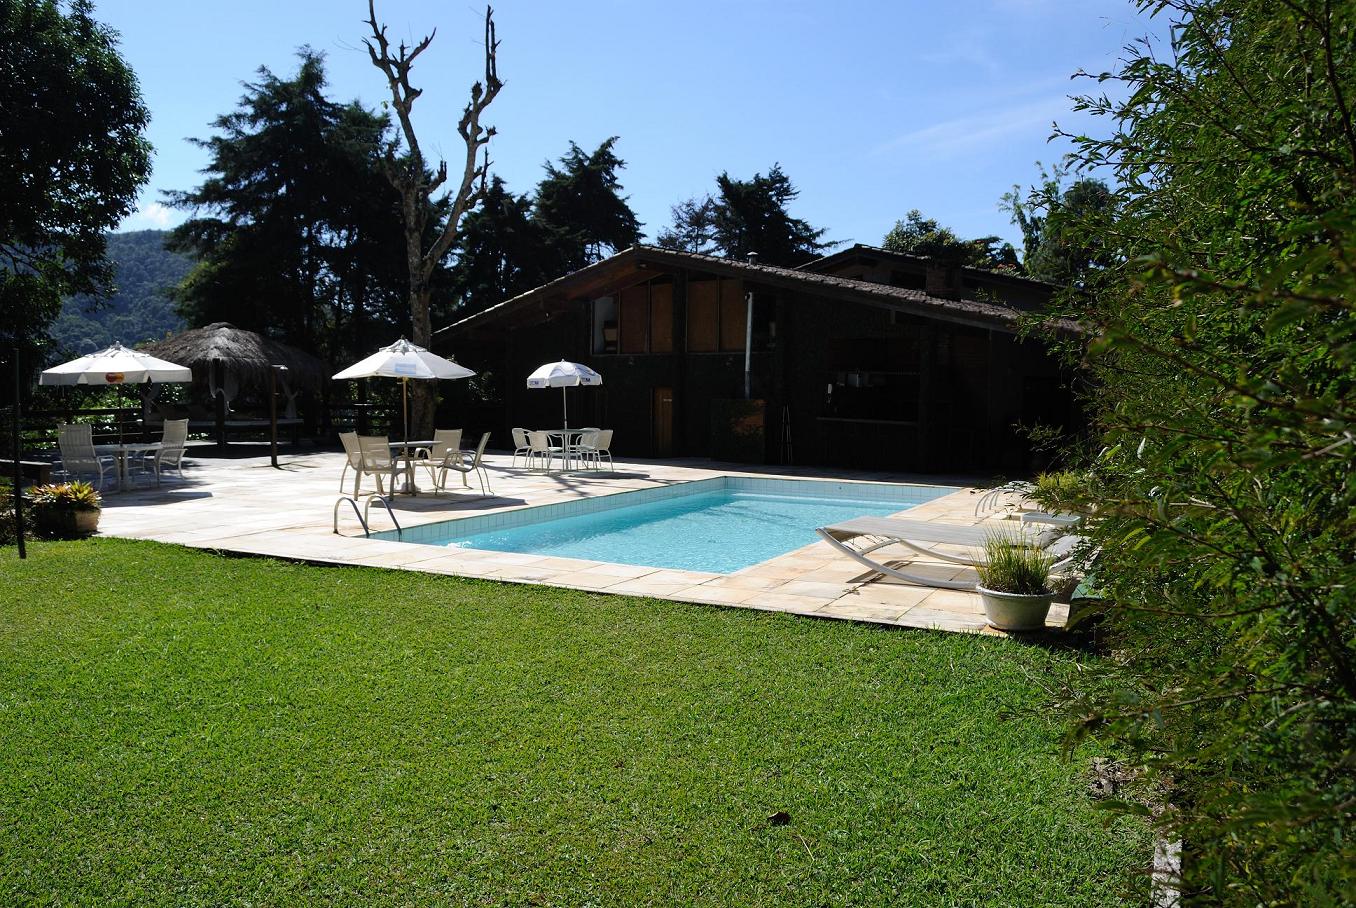 swimmingpool-Atelier Molinaro-Brazil-world cup